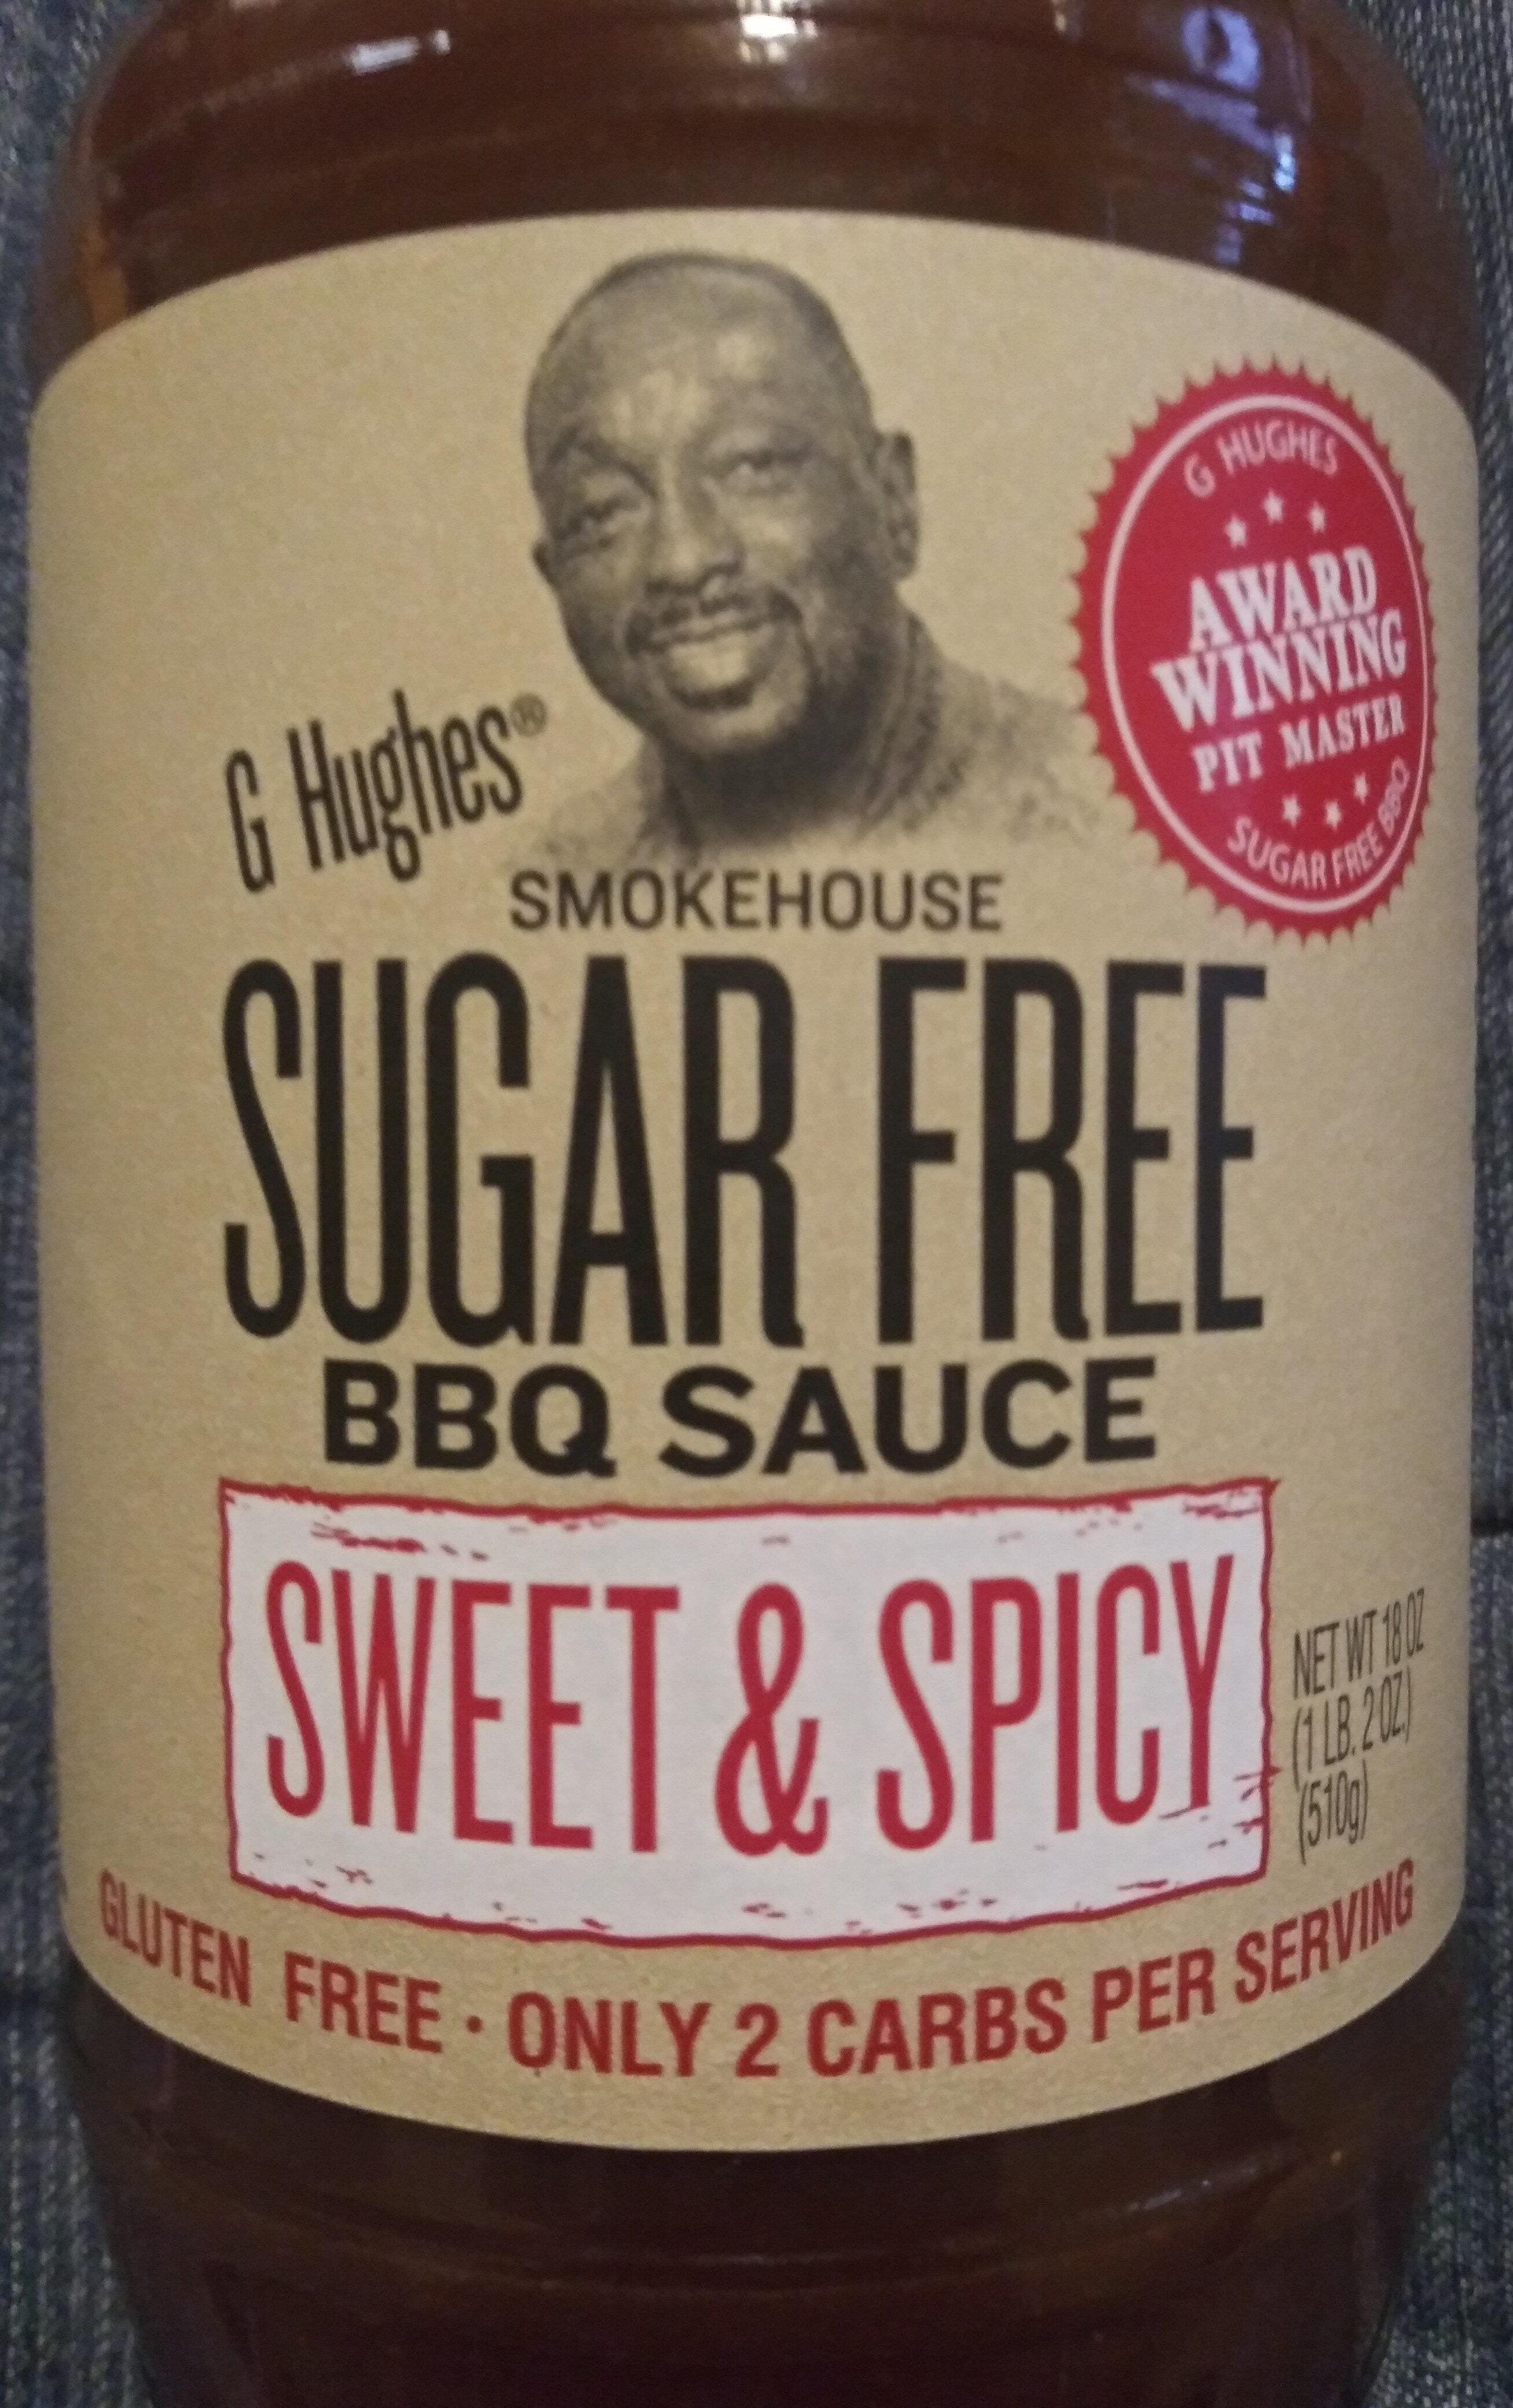 Sugar Free BBQ sauce Sweet & Spicy - Product - en